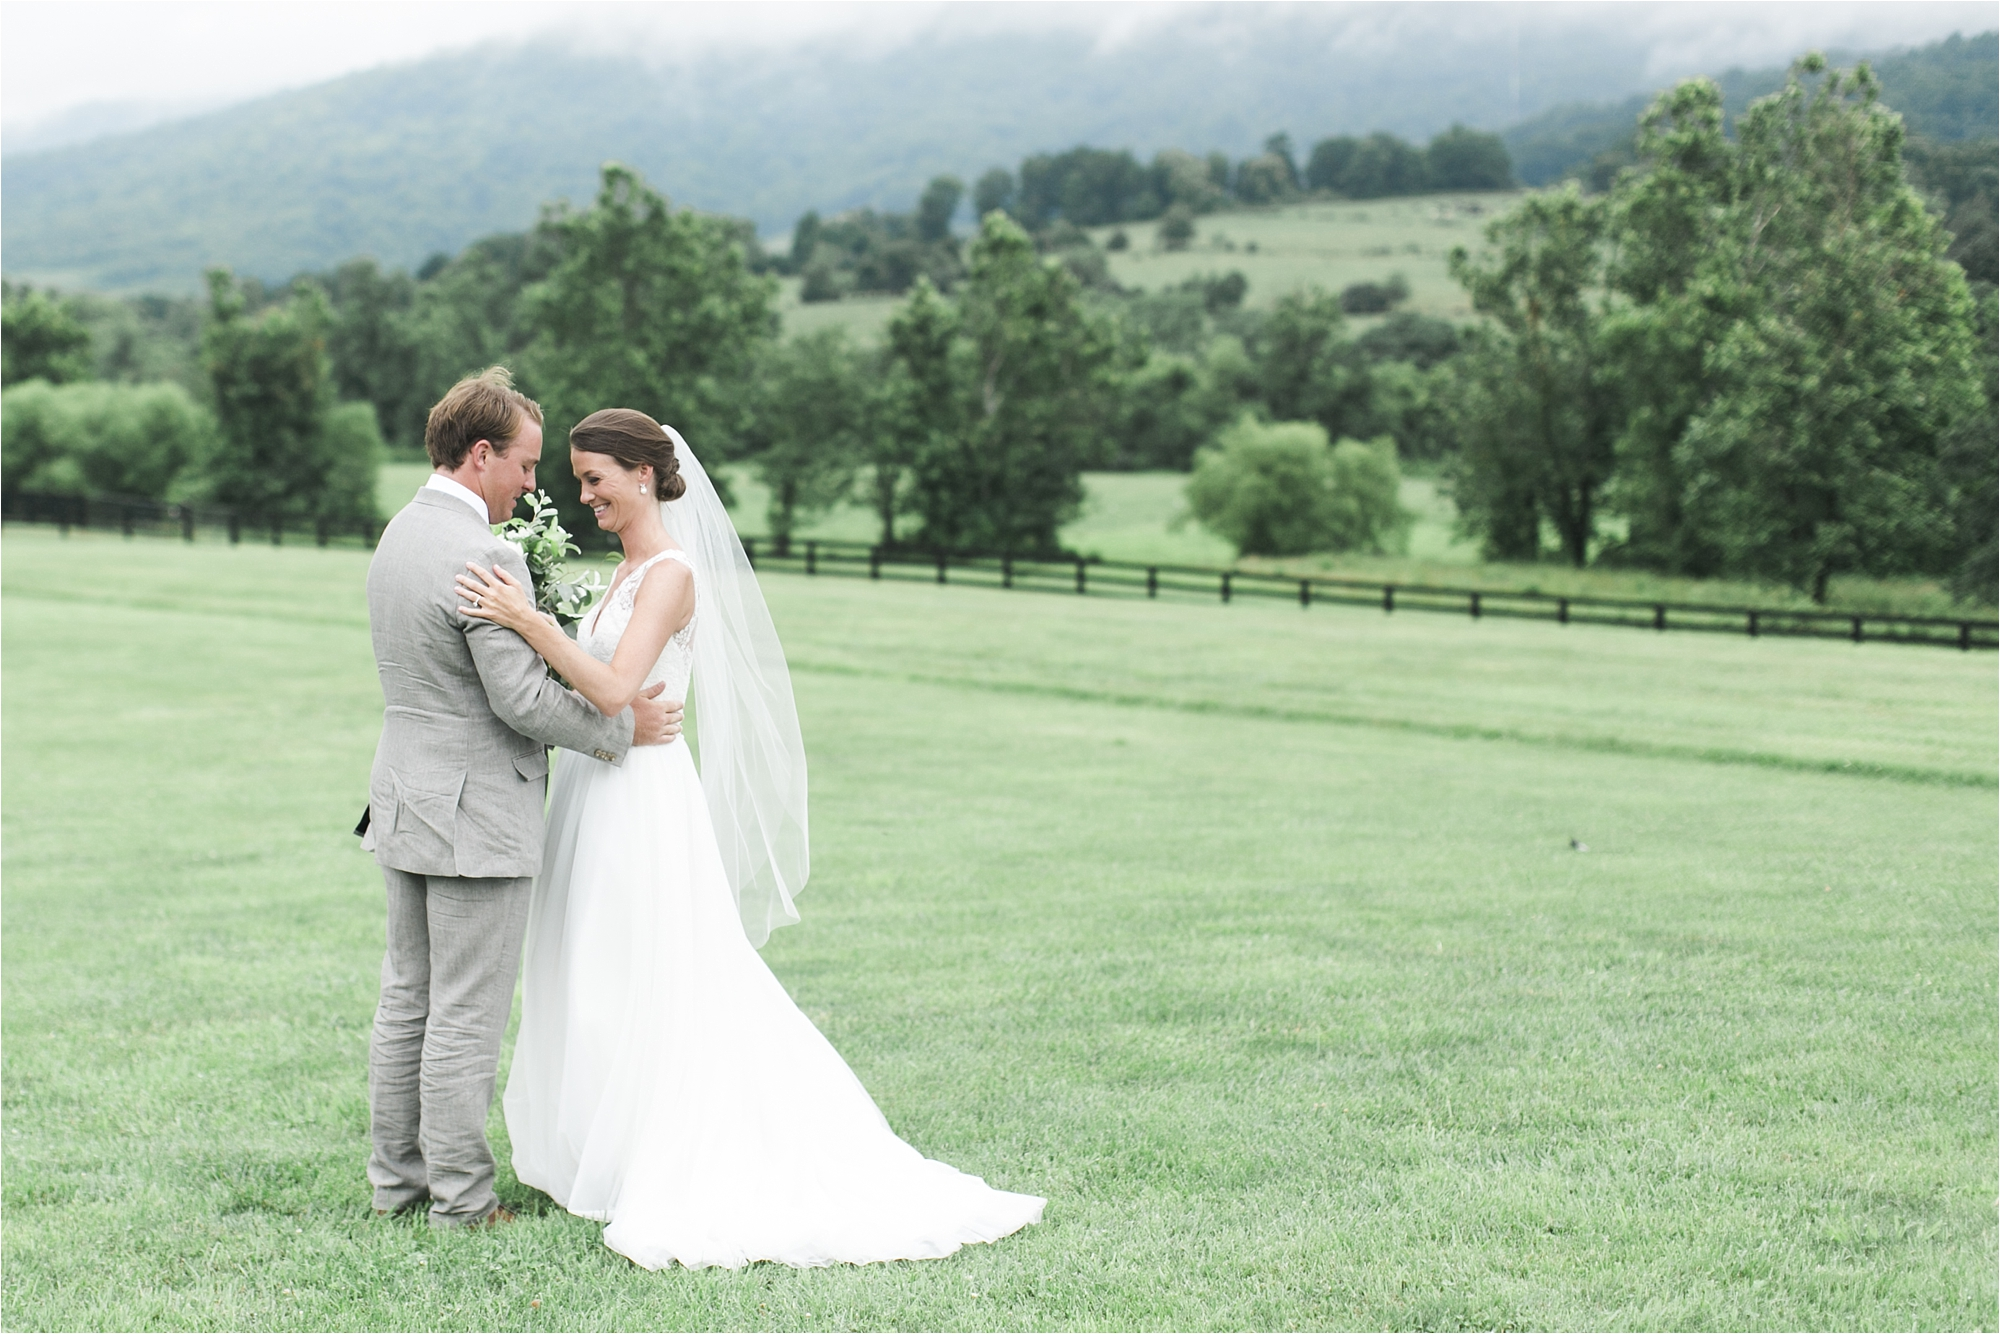 stephanie-yonce-charlottesville-virginia-king-family-vineyard-wedding-photos_0011.jpg